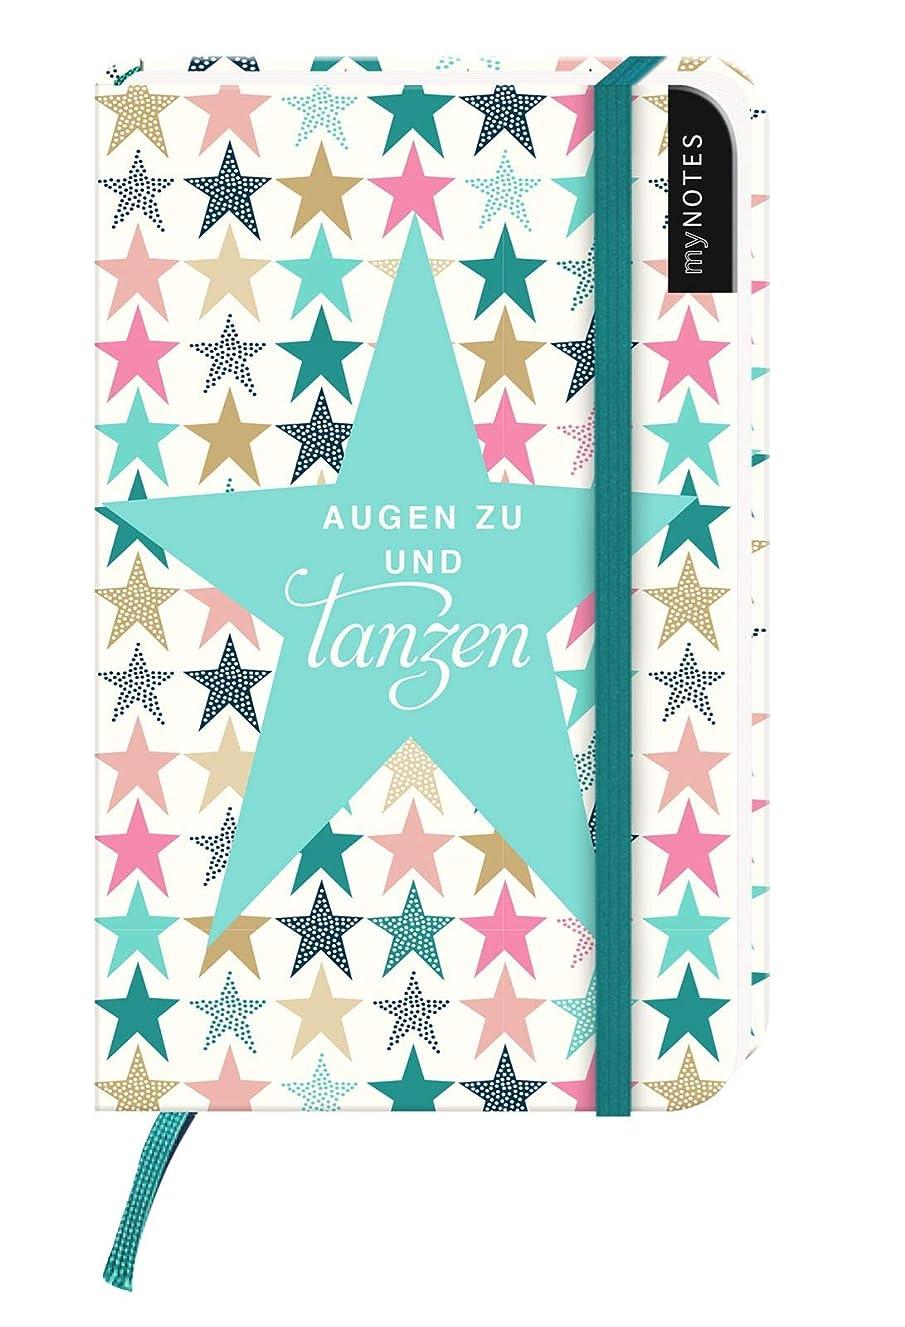 阻害する同封する政策myNOTES: Augen zu und tanzen / Notizbuch klein / Blanko